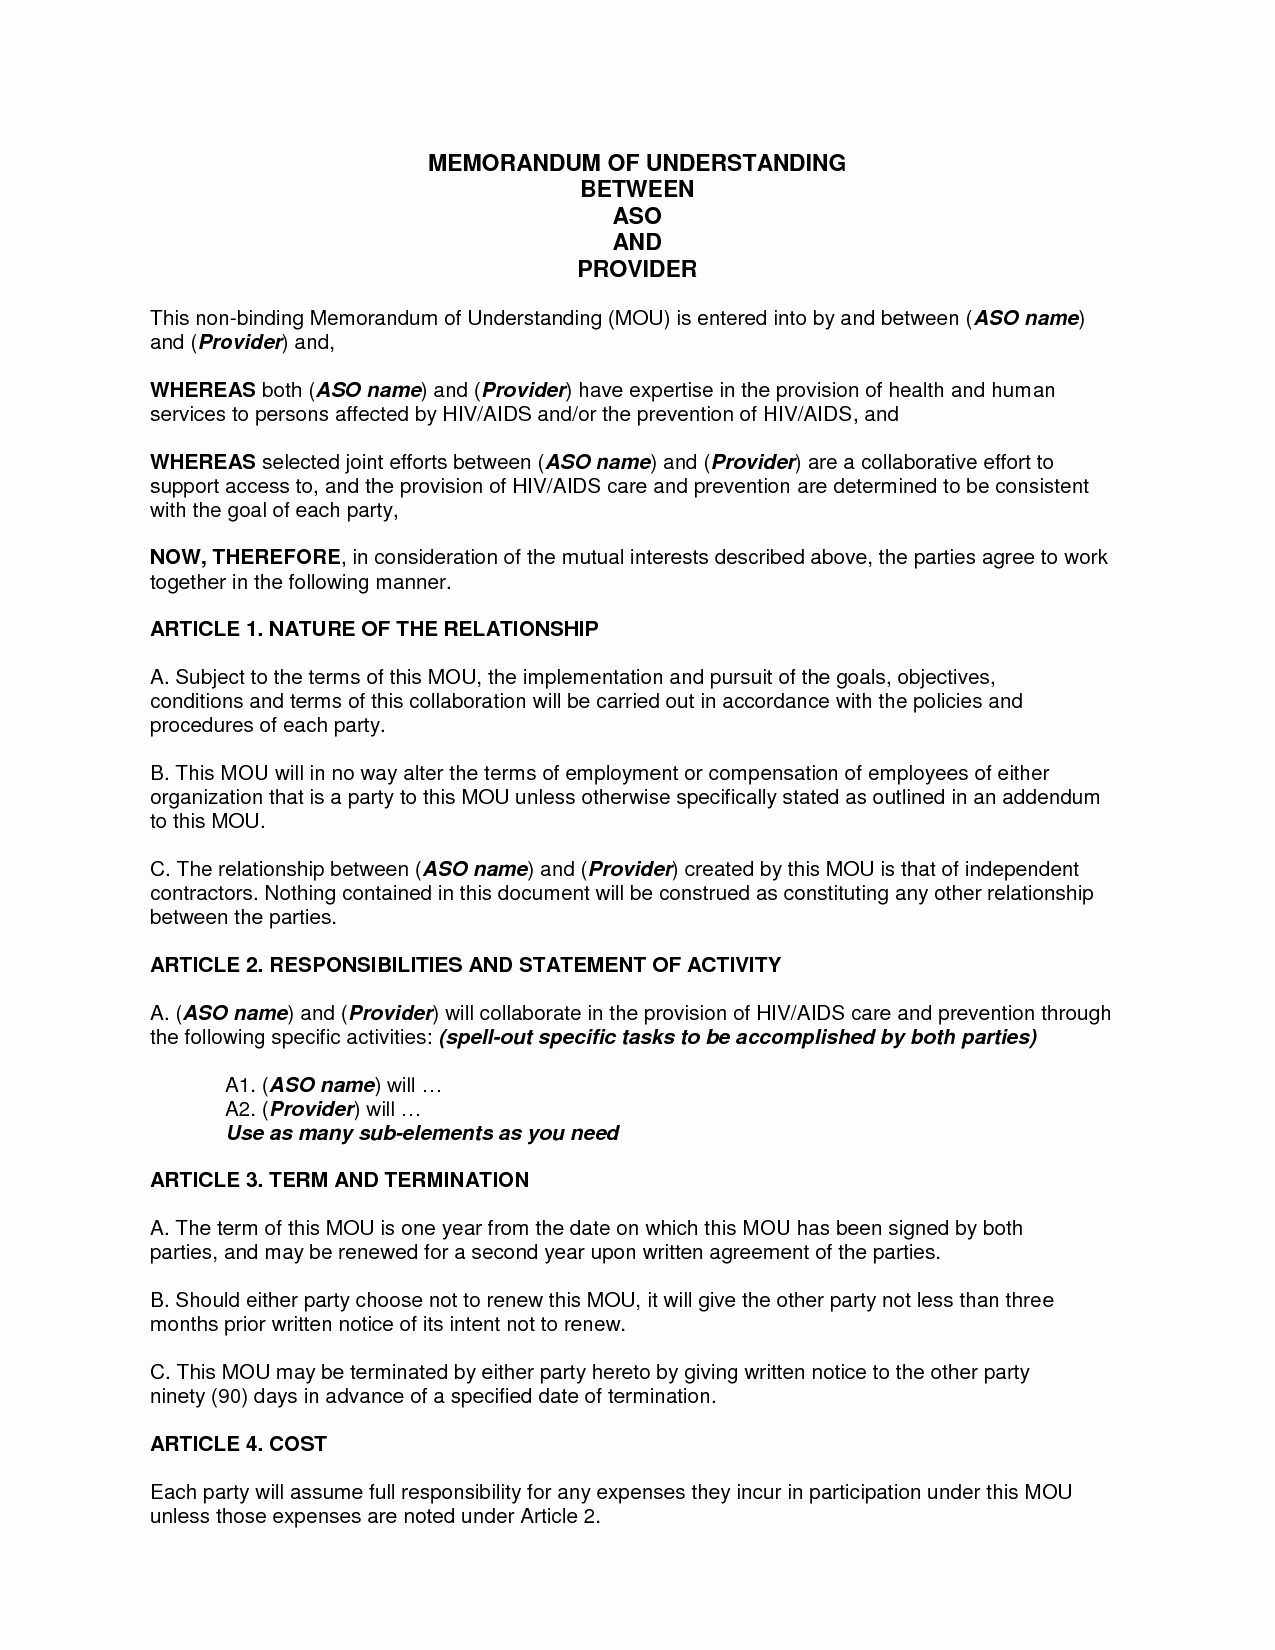 Memorandums Of Understanding Examples Lovely Sample Memorandum Of Understanding Business Partnership